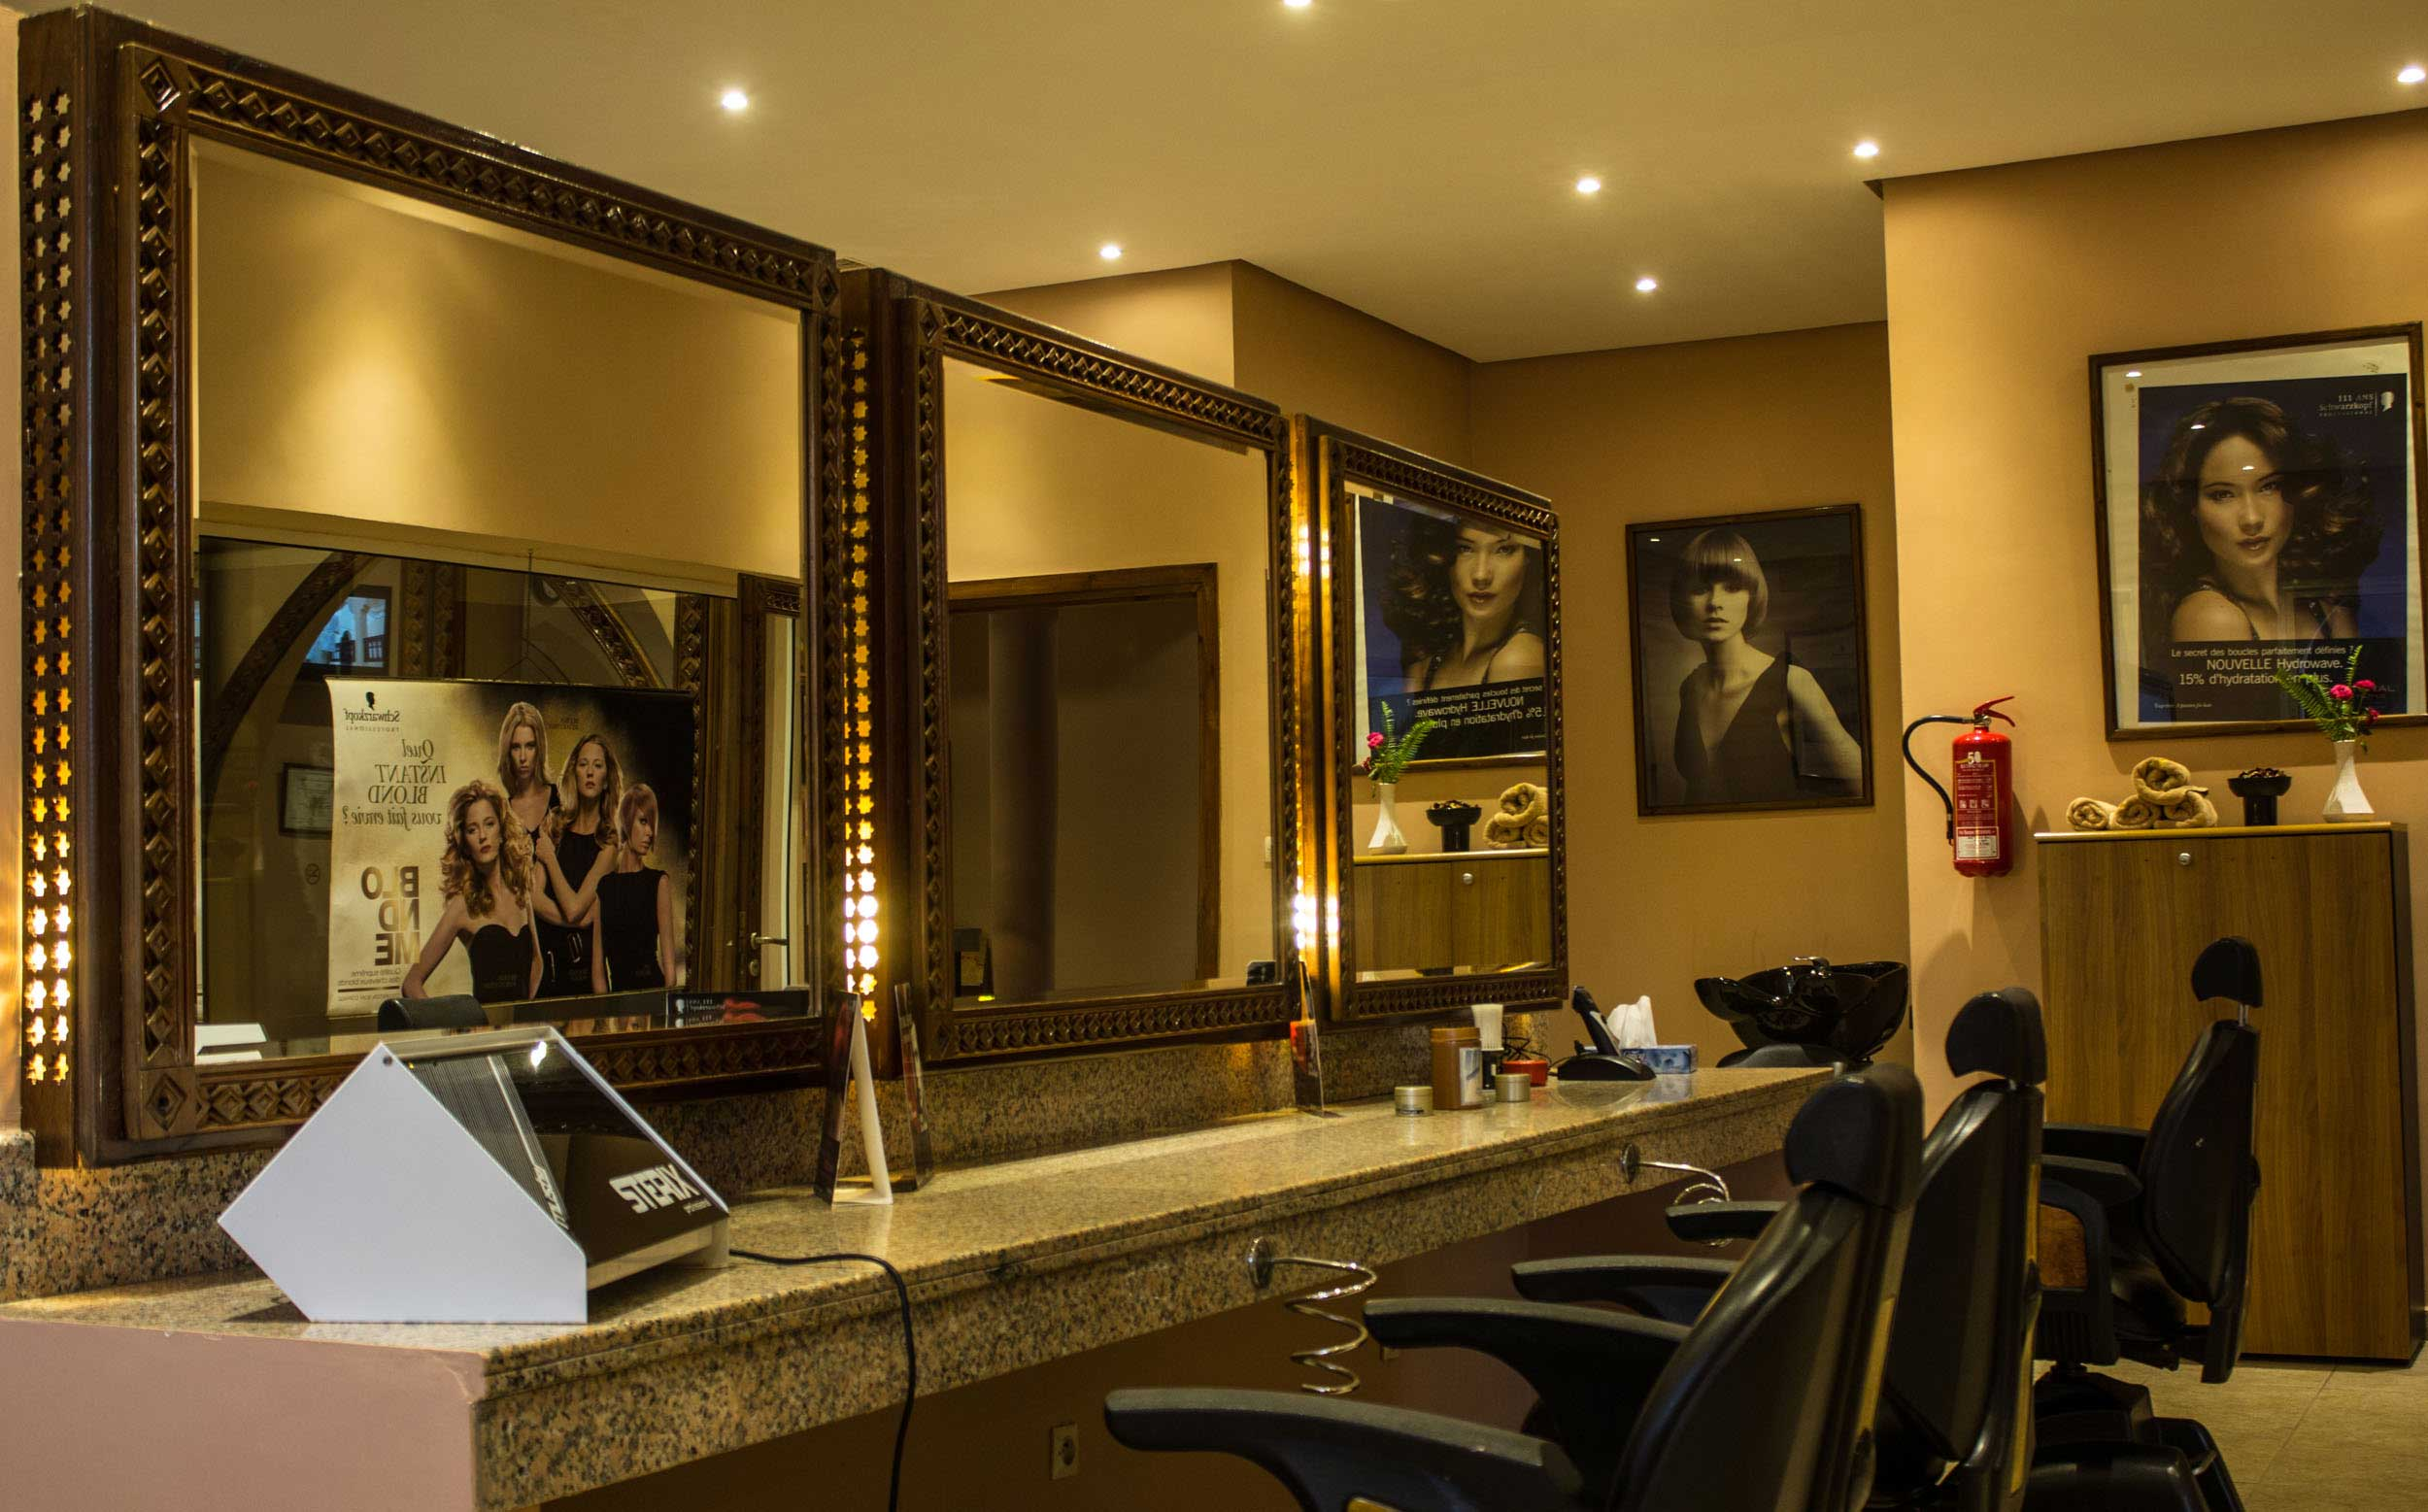 http://palaisdesroses.com/wp-content/uploads/2016/11/Salon-de-coiffure-1.jpg